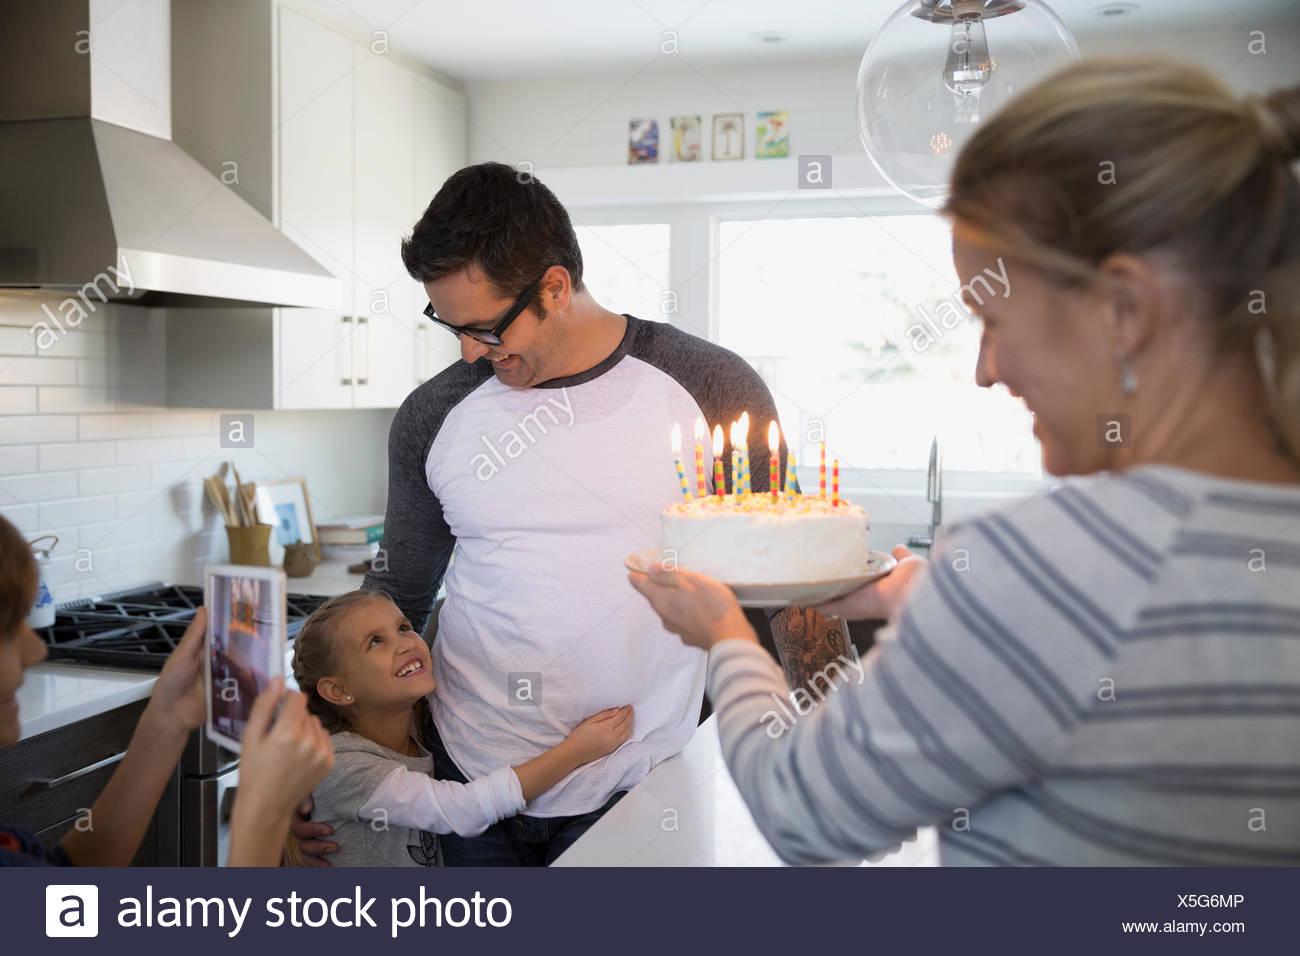 Family celebrating with birthday cake in kitchen - Stock Image